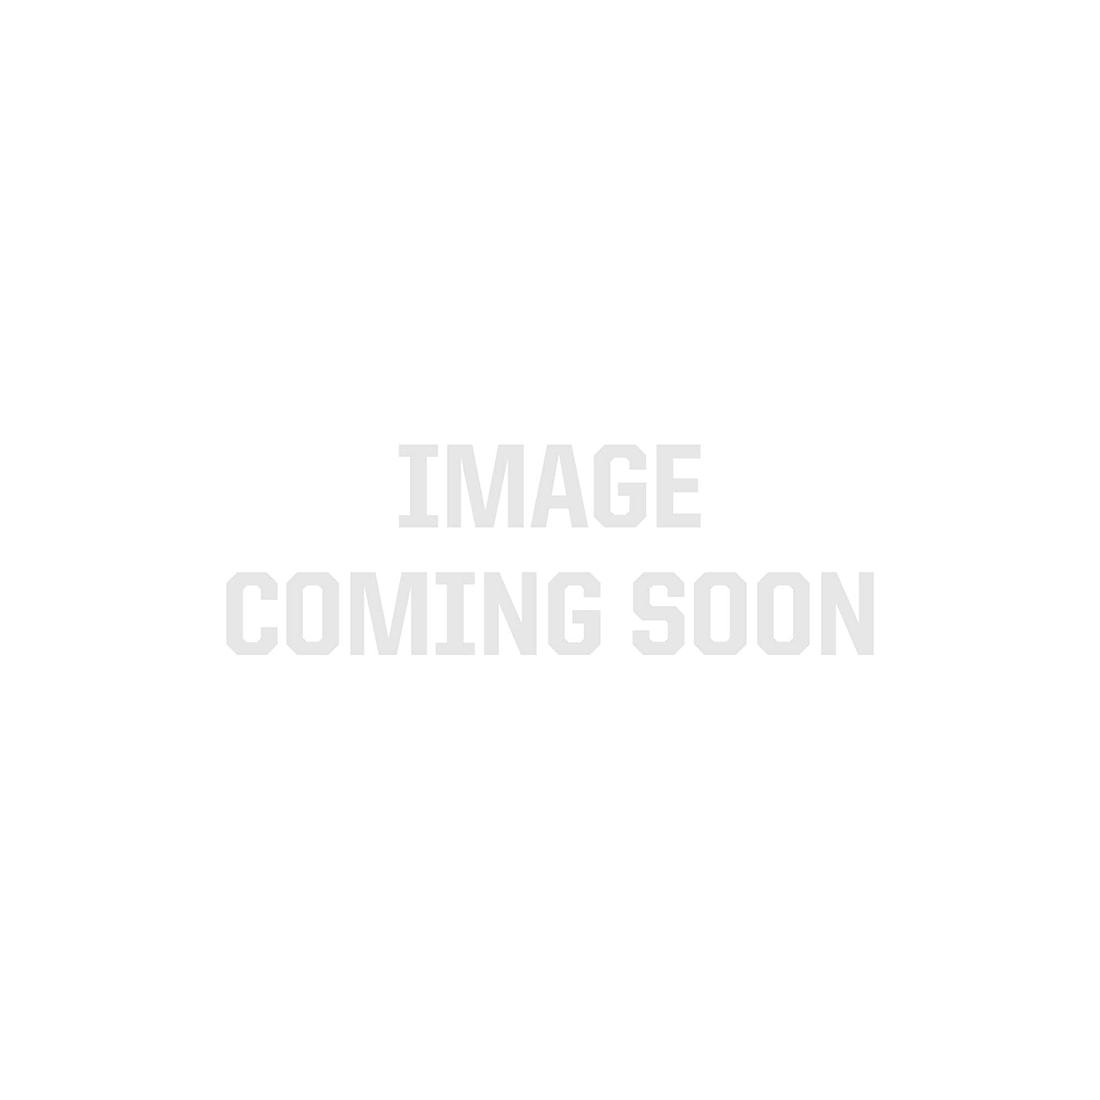 Blue 3528 Single Row LED Strip Light, 240/m, 10mm wide, Sample Kit